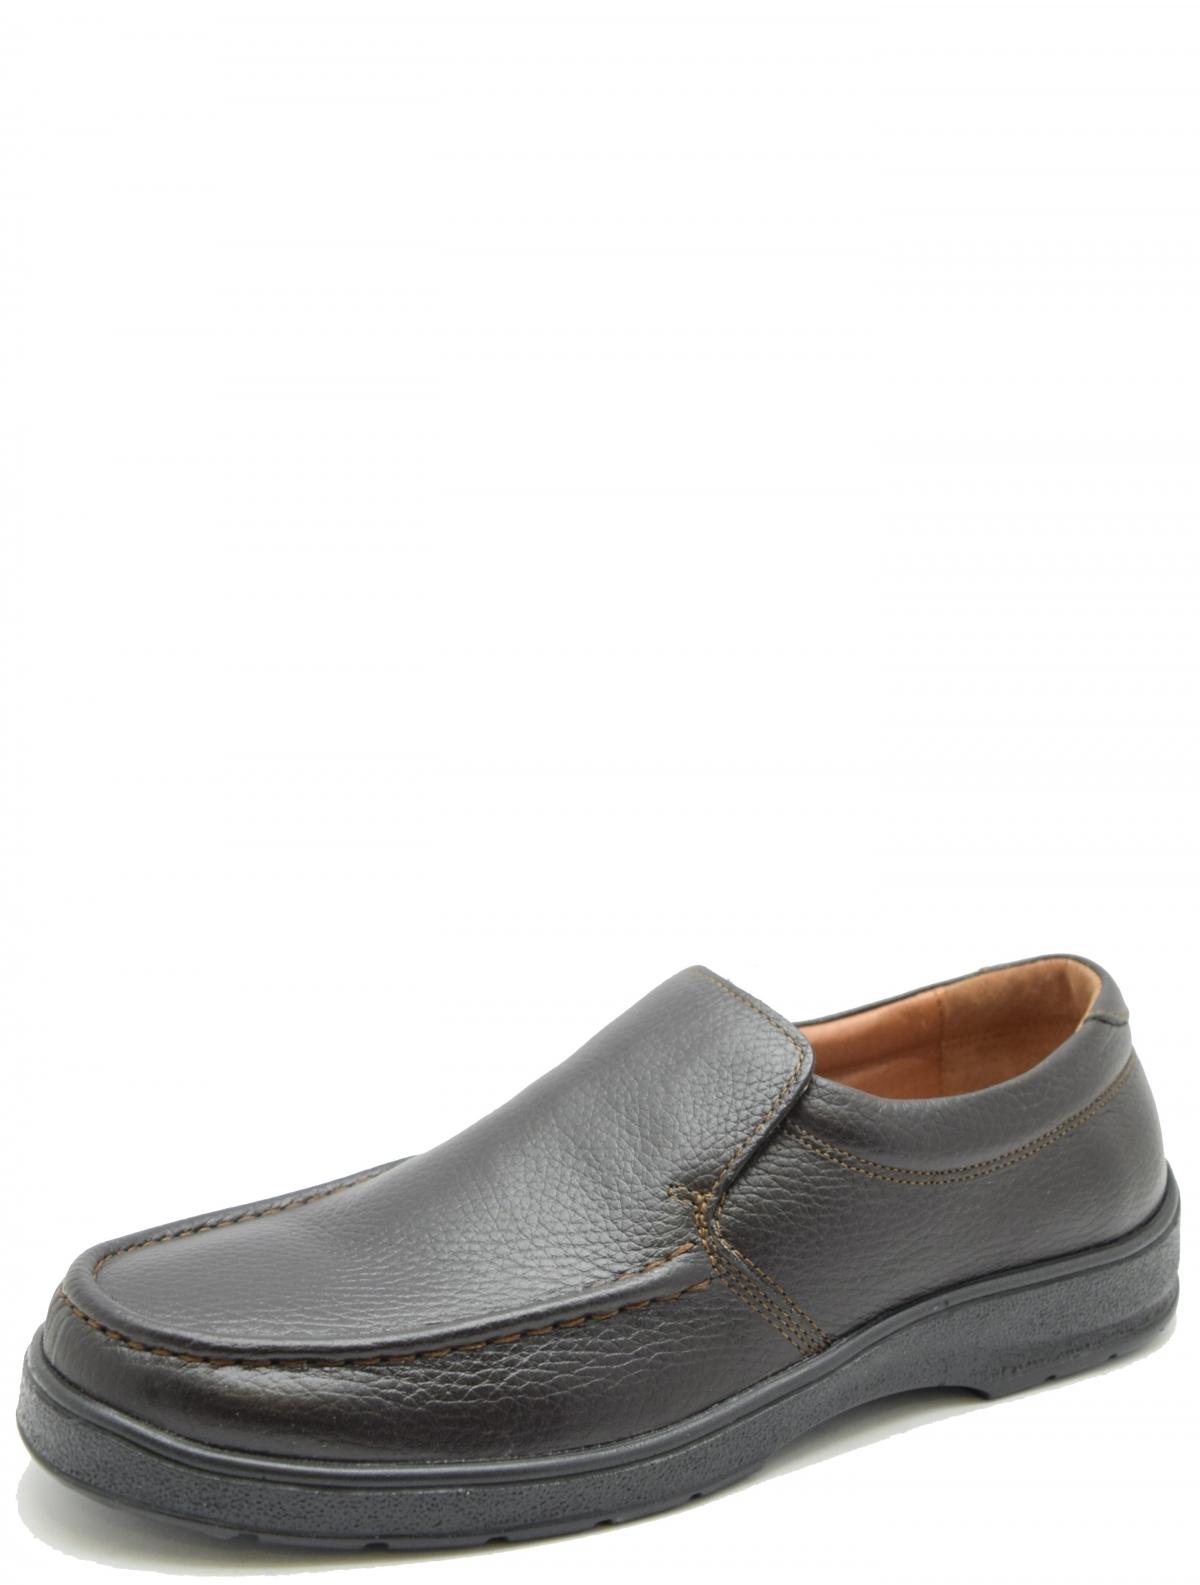 Bossner 2-305-301 мужские туфли